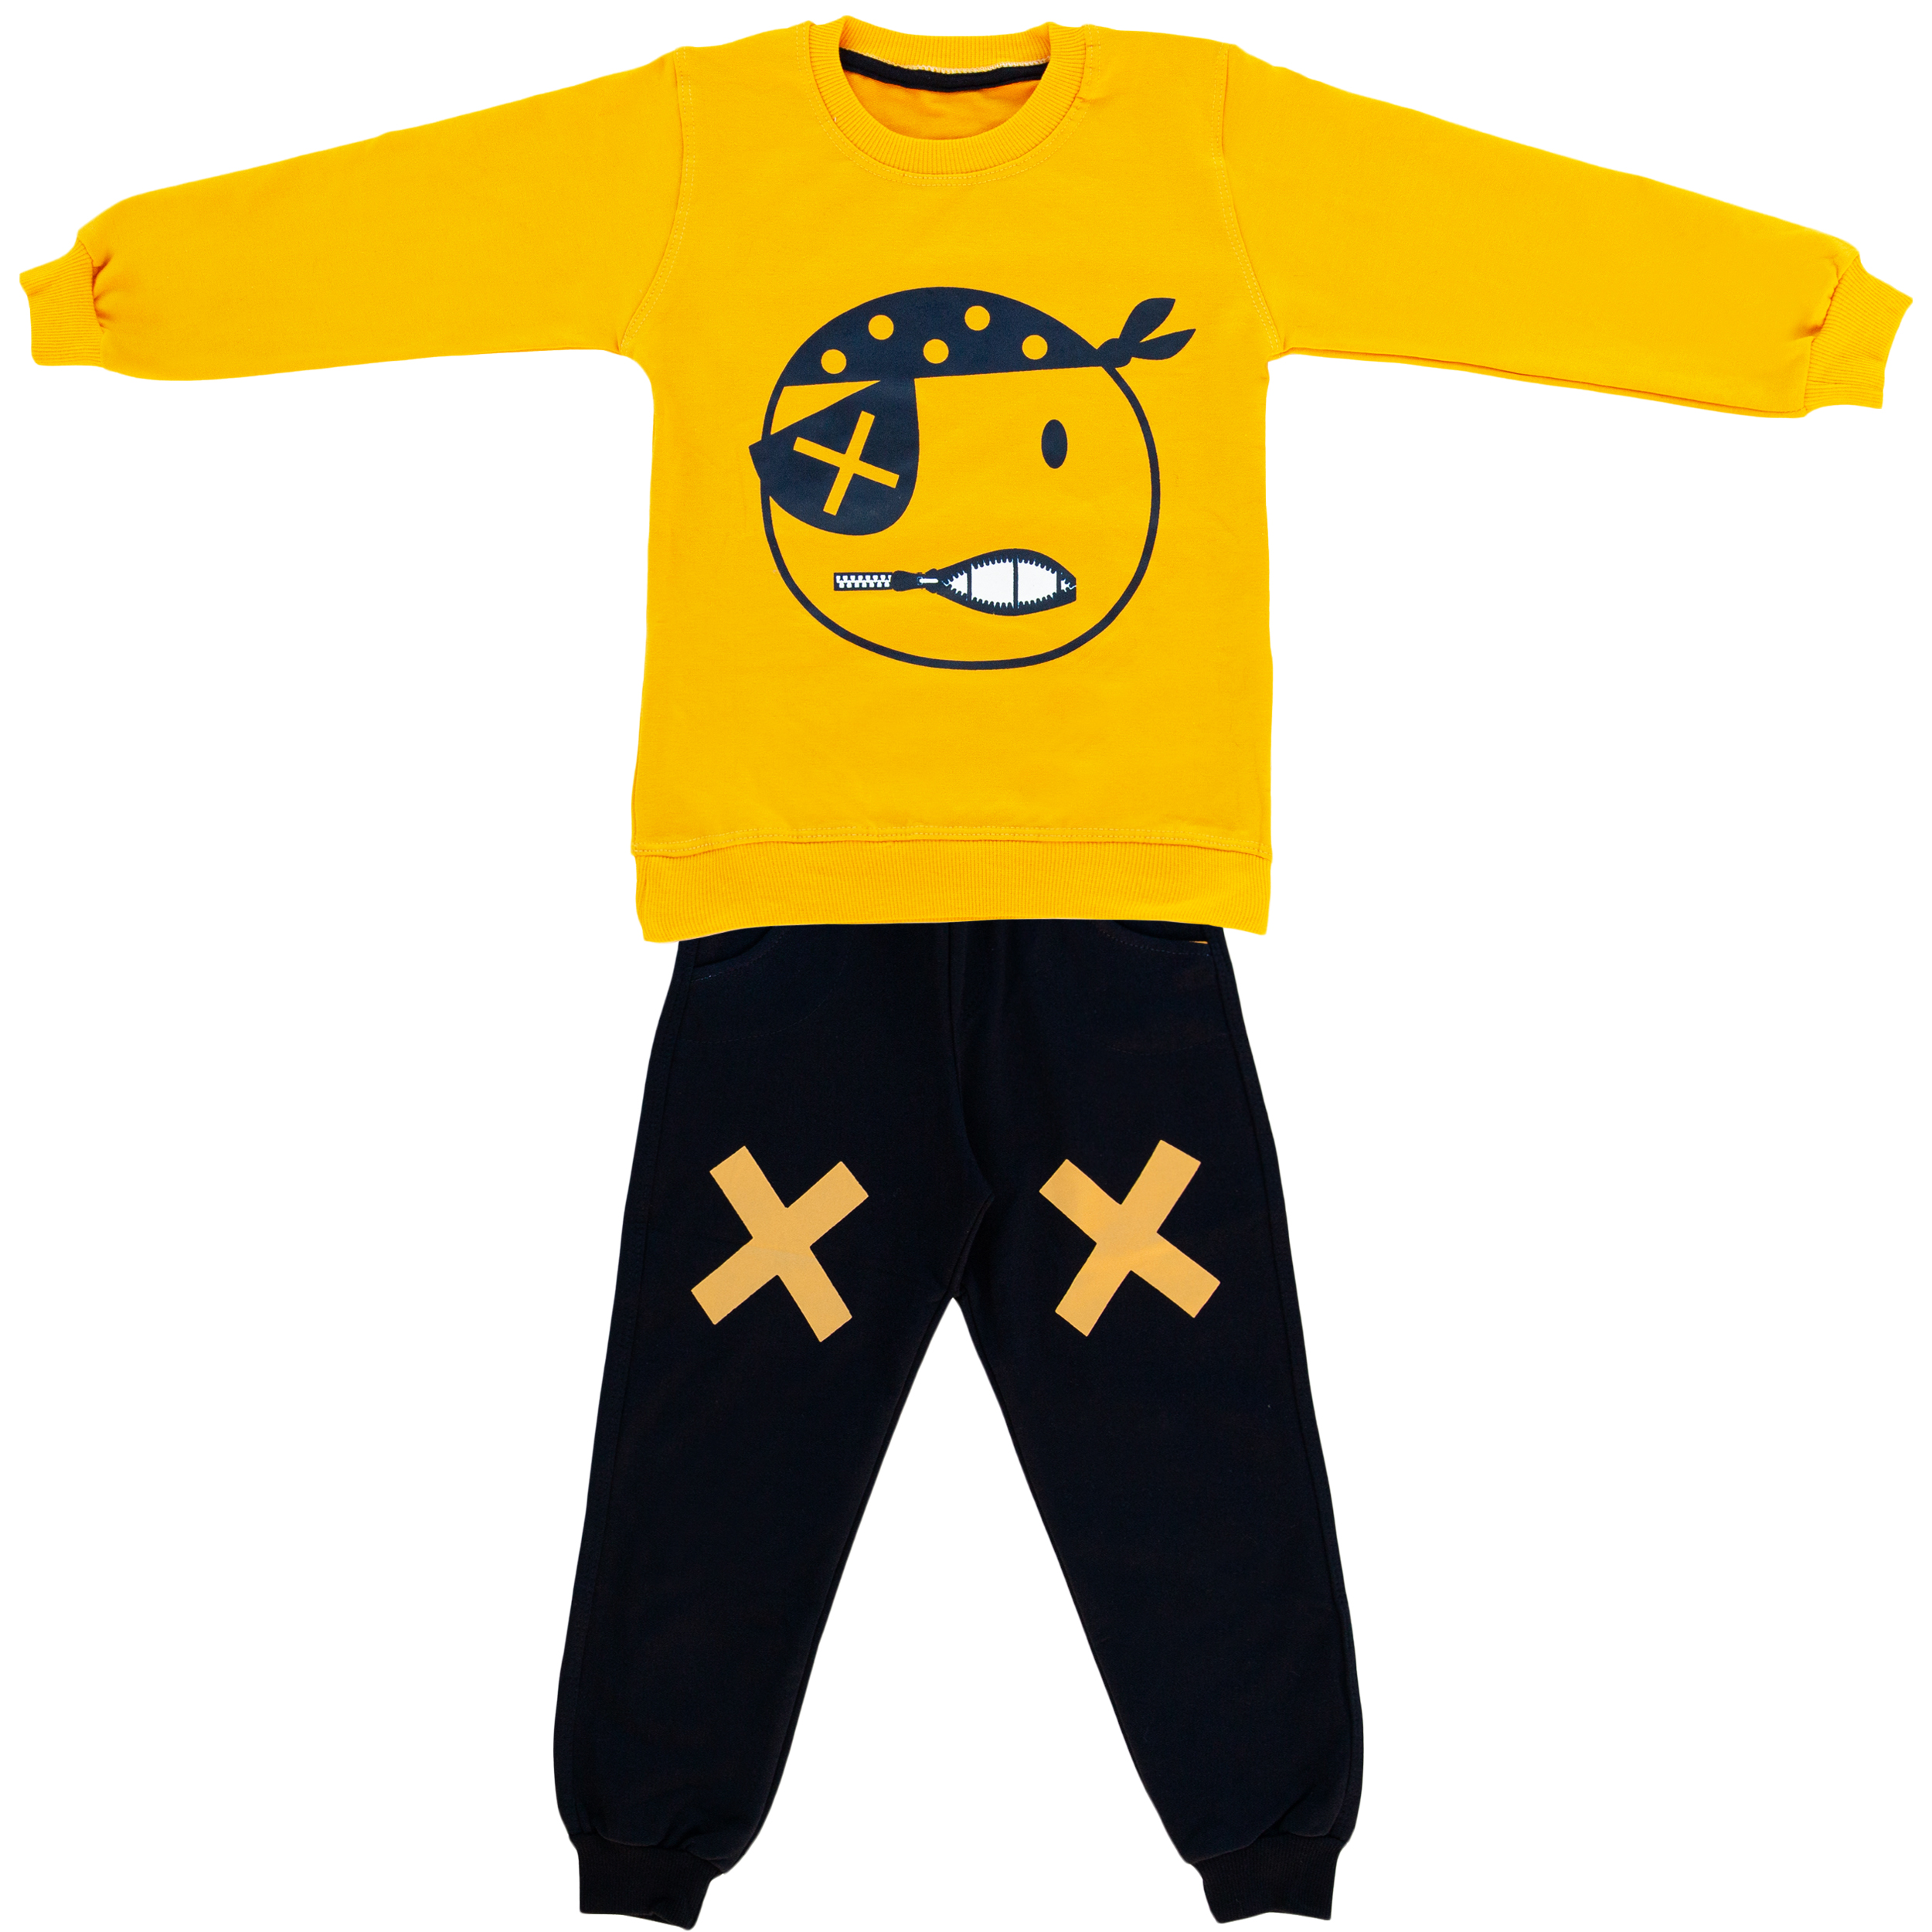 خرید                     ست سویشرت و شلوار پسرانه طرح دزد دریایی کد 333 رنگ زرد